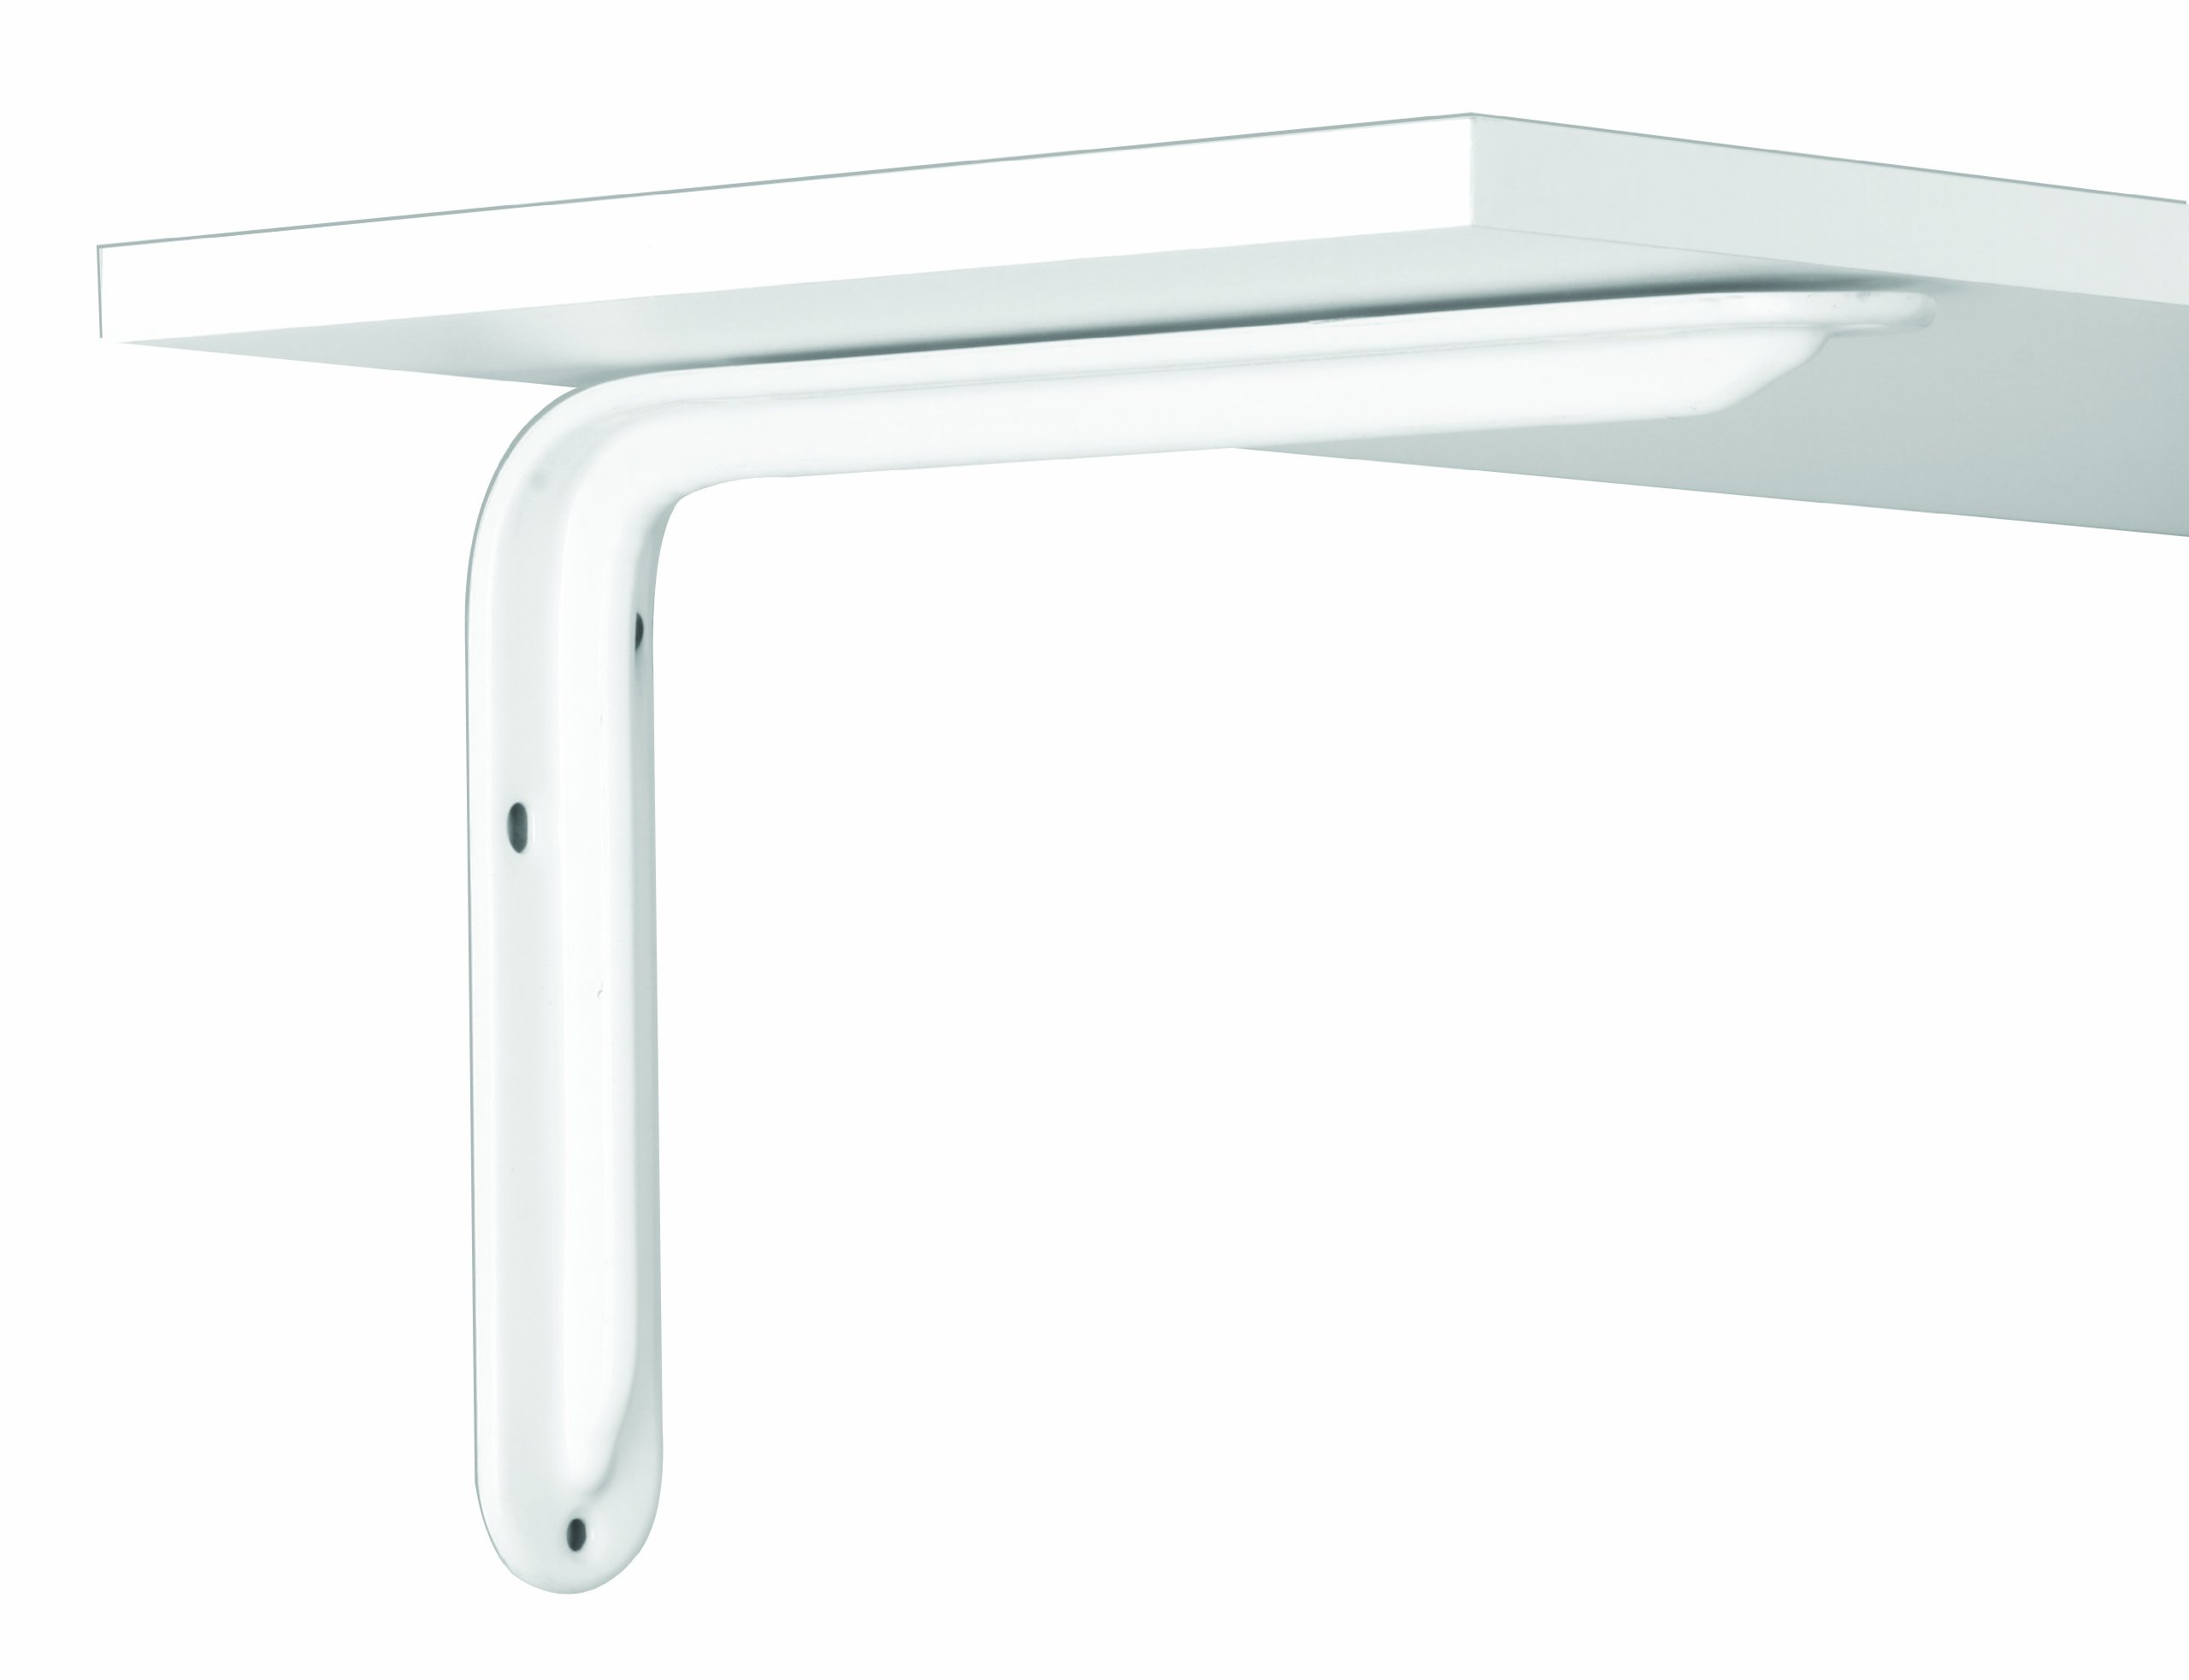 Knape & Vogt John Sterling Magnum Style Decorative Shelf Bracket, 12-inch, Warm White, RP-0099-12WT